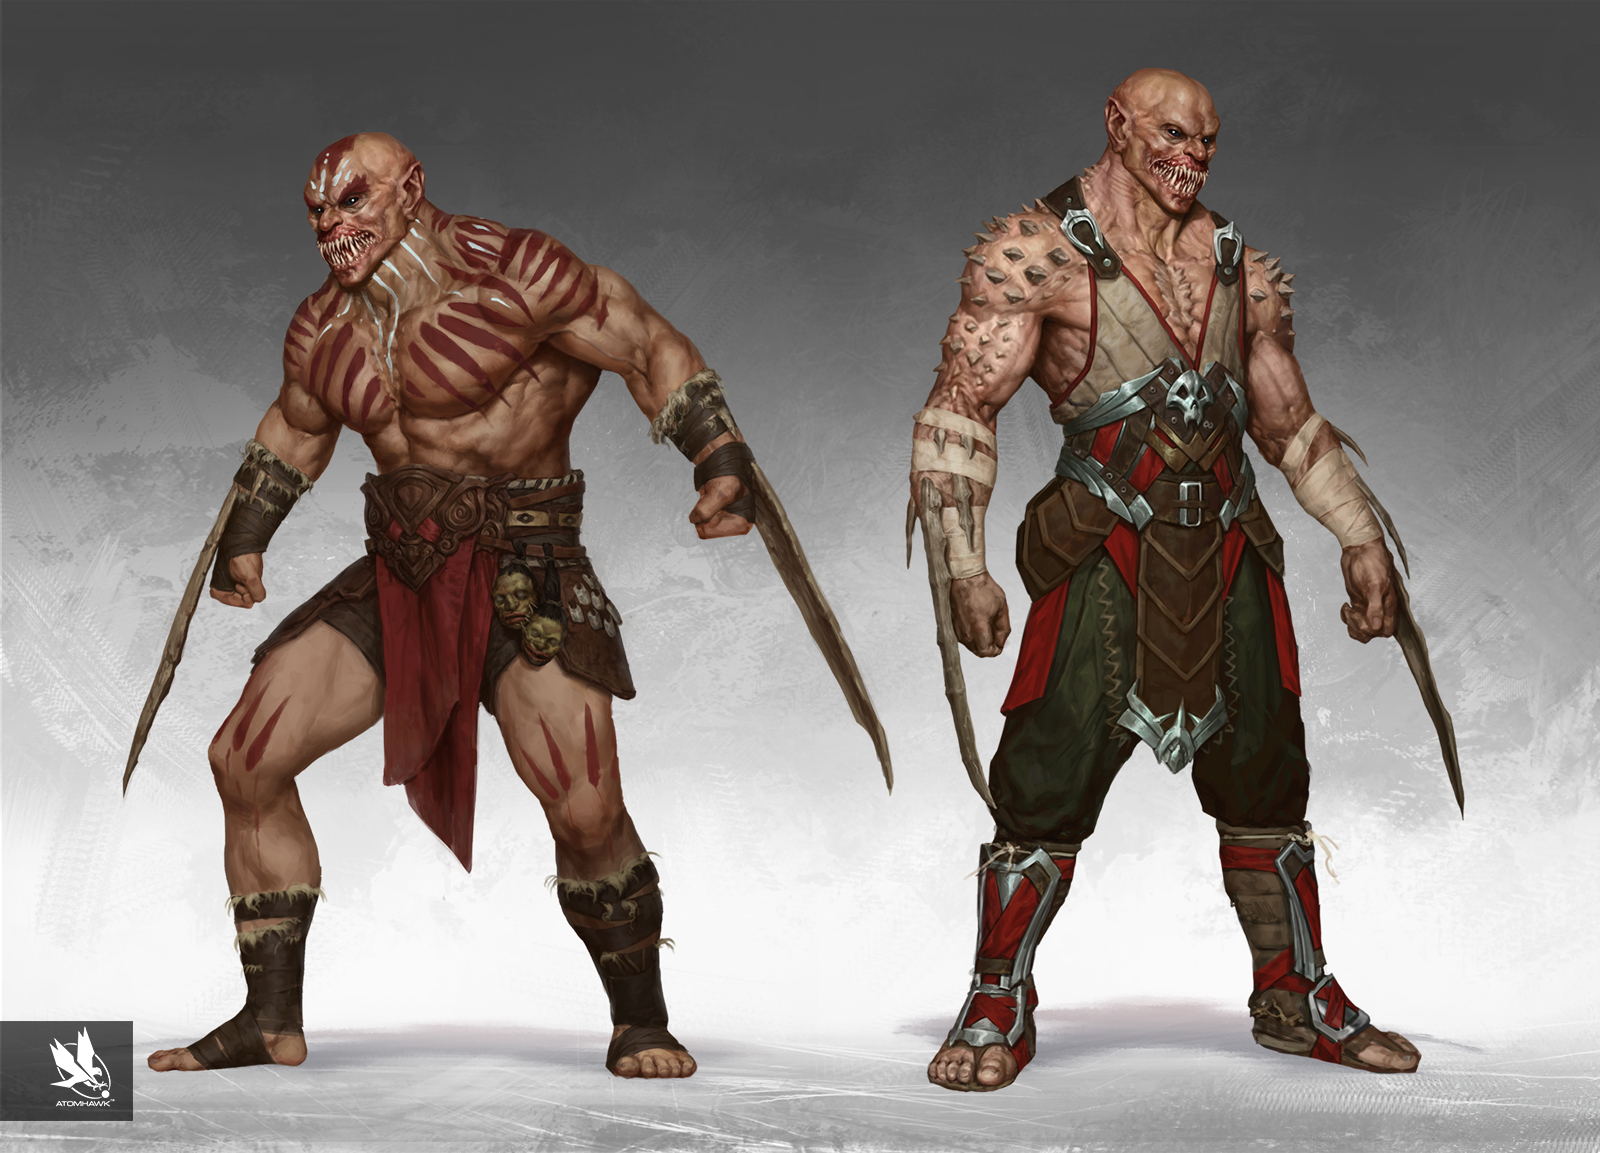 Mortal Kombat 11 Atomhawk We Bring Ideas To Life